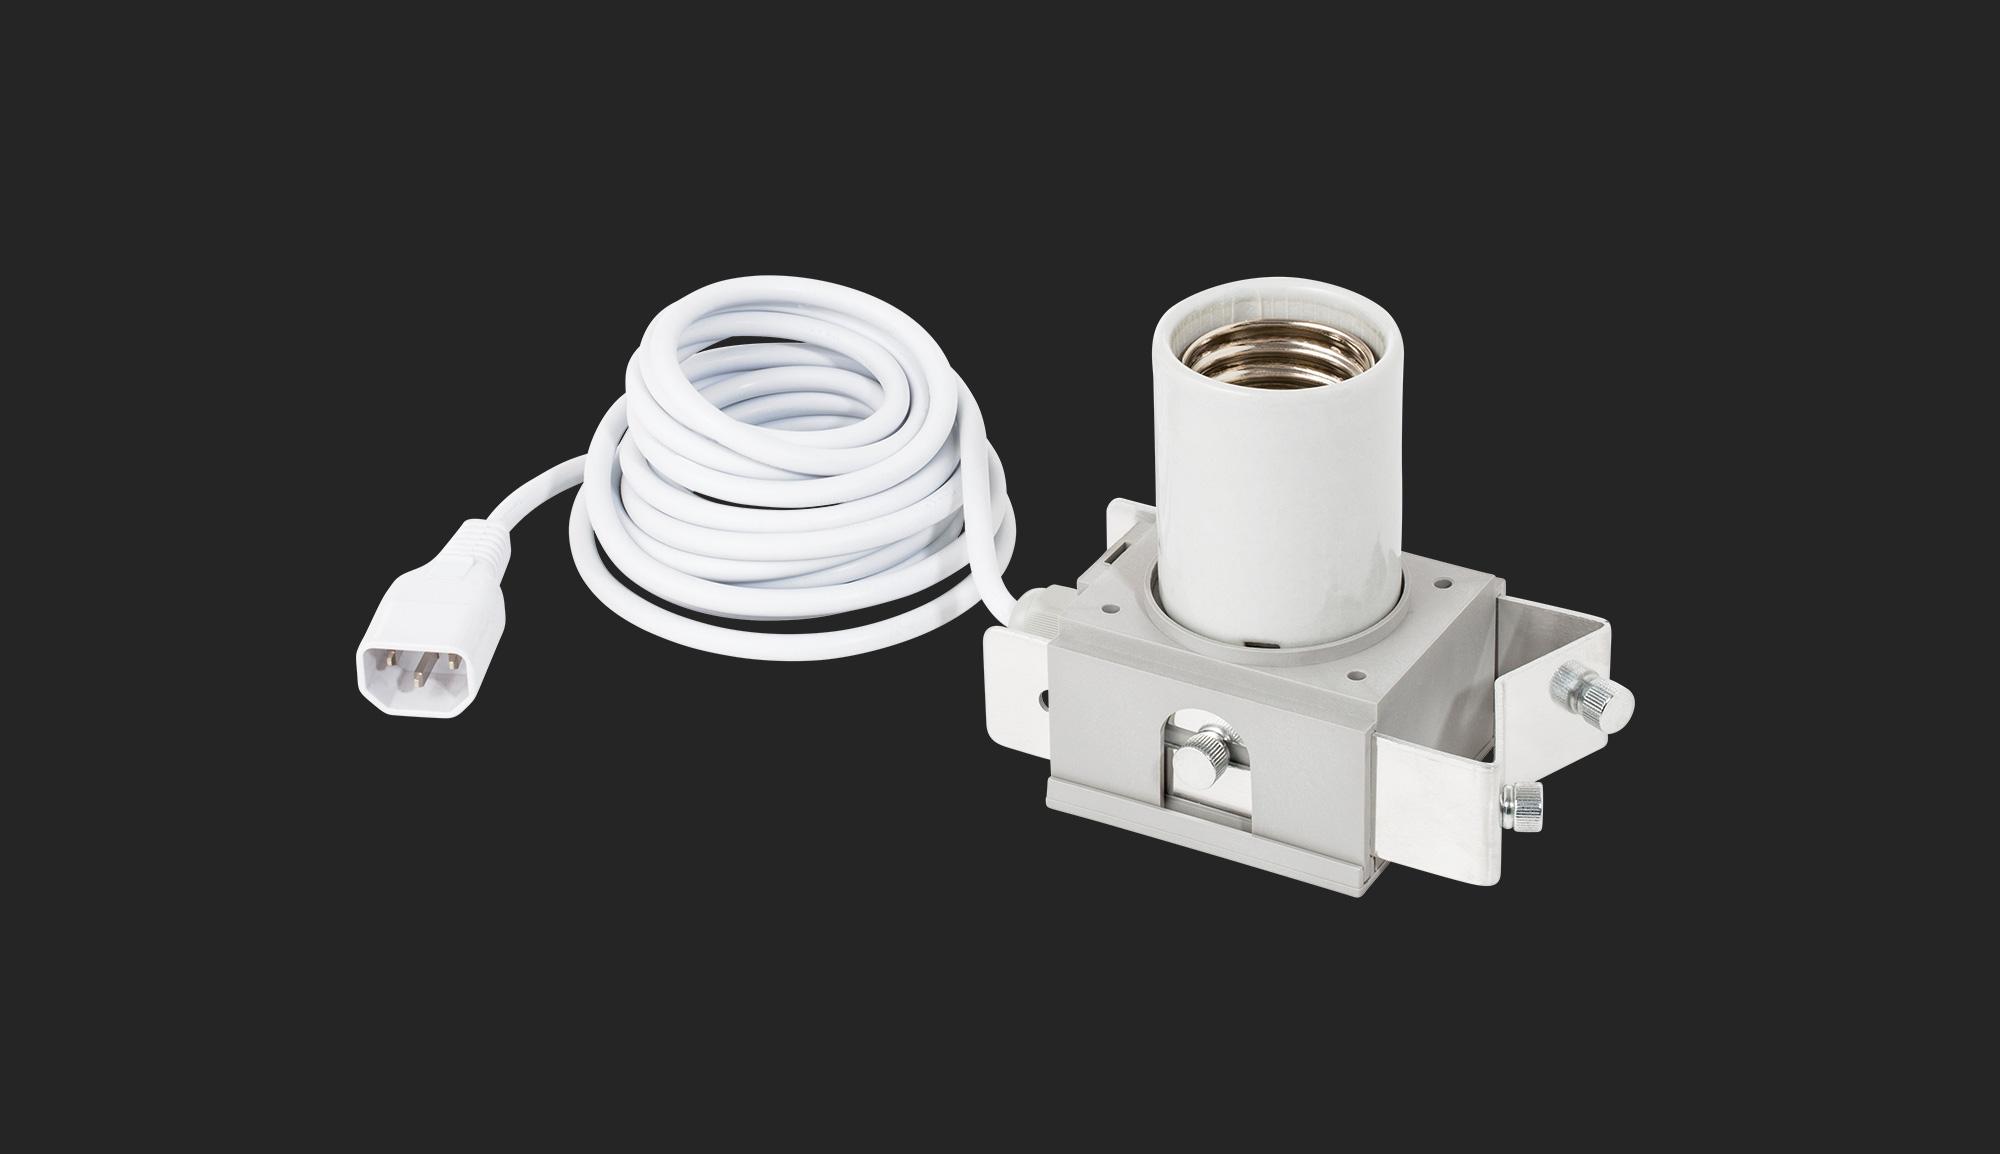 E40 Lamp Holder IEC - Adjust-A-Wings